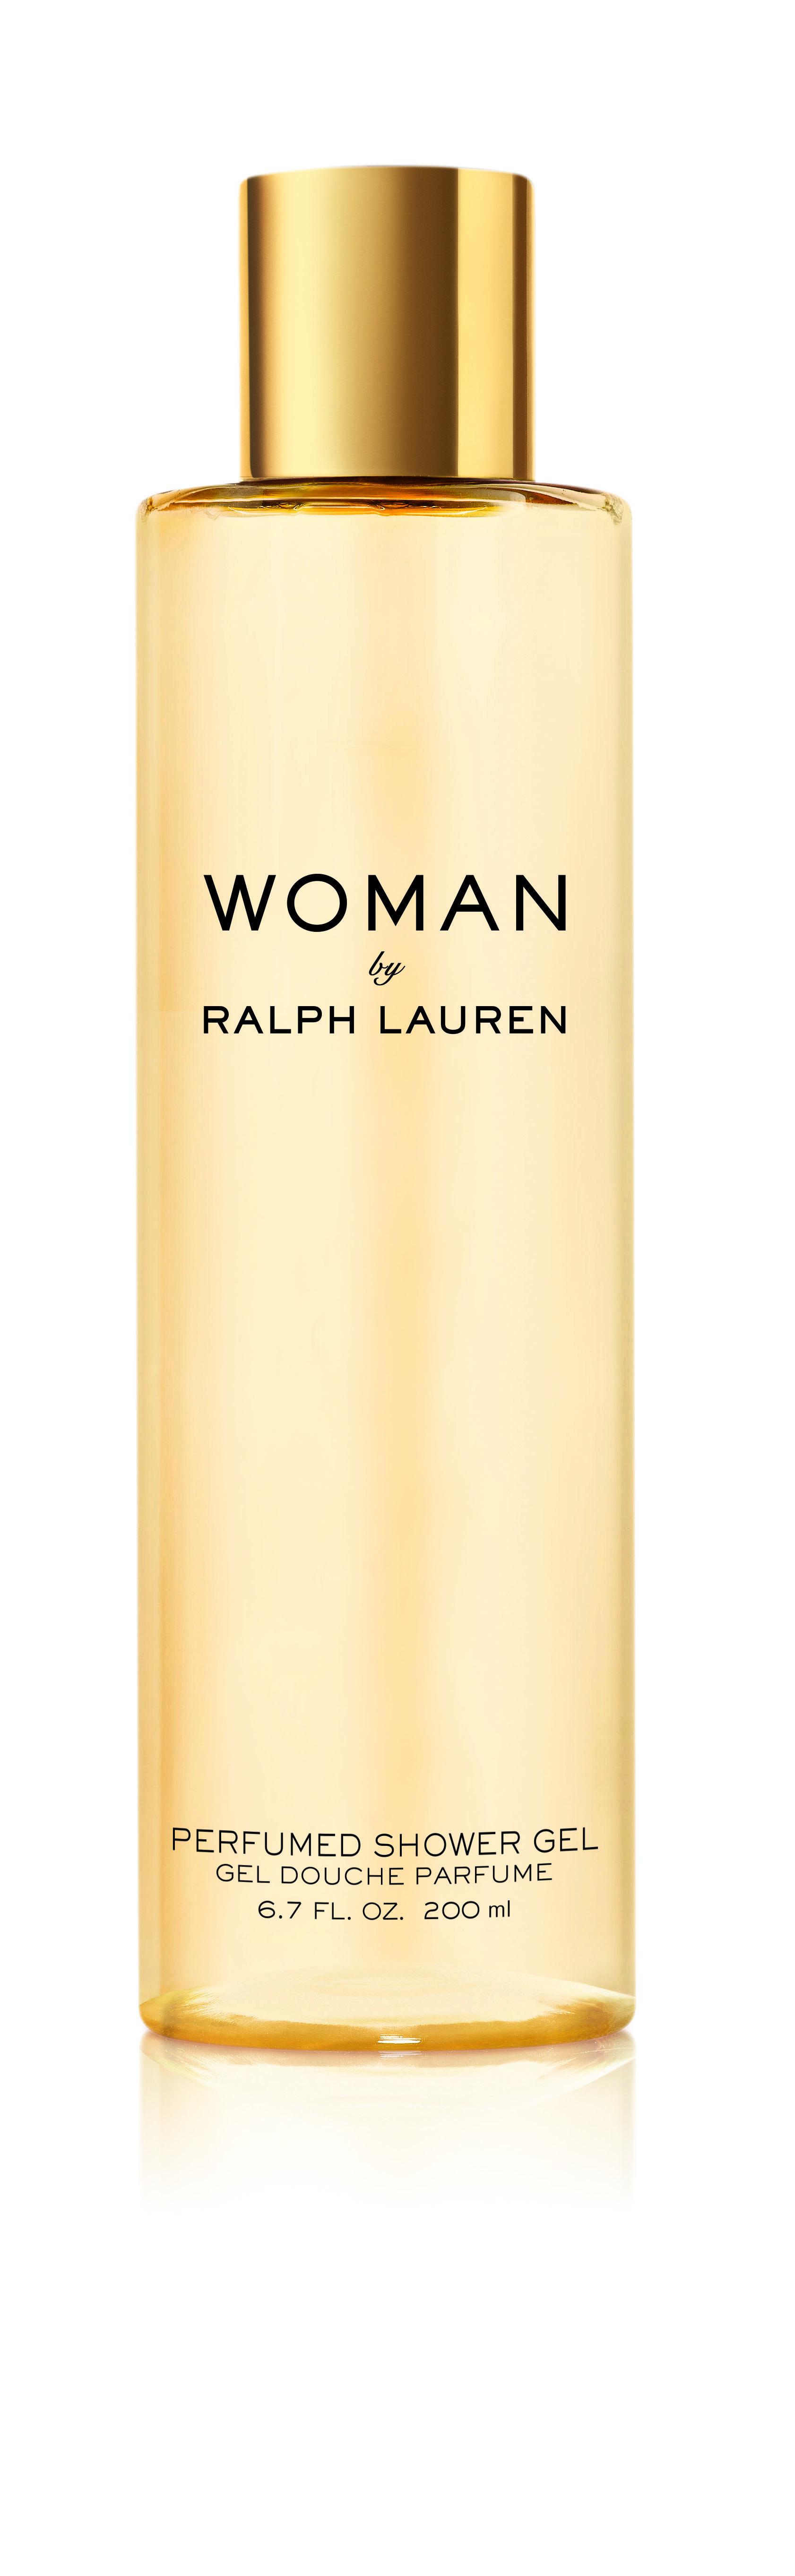 Woman By Ralph Lauren Shower Gel 200ml